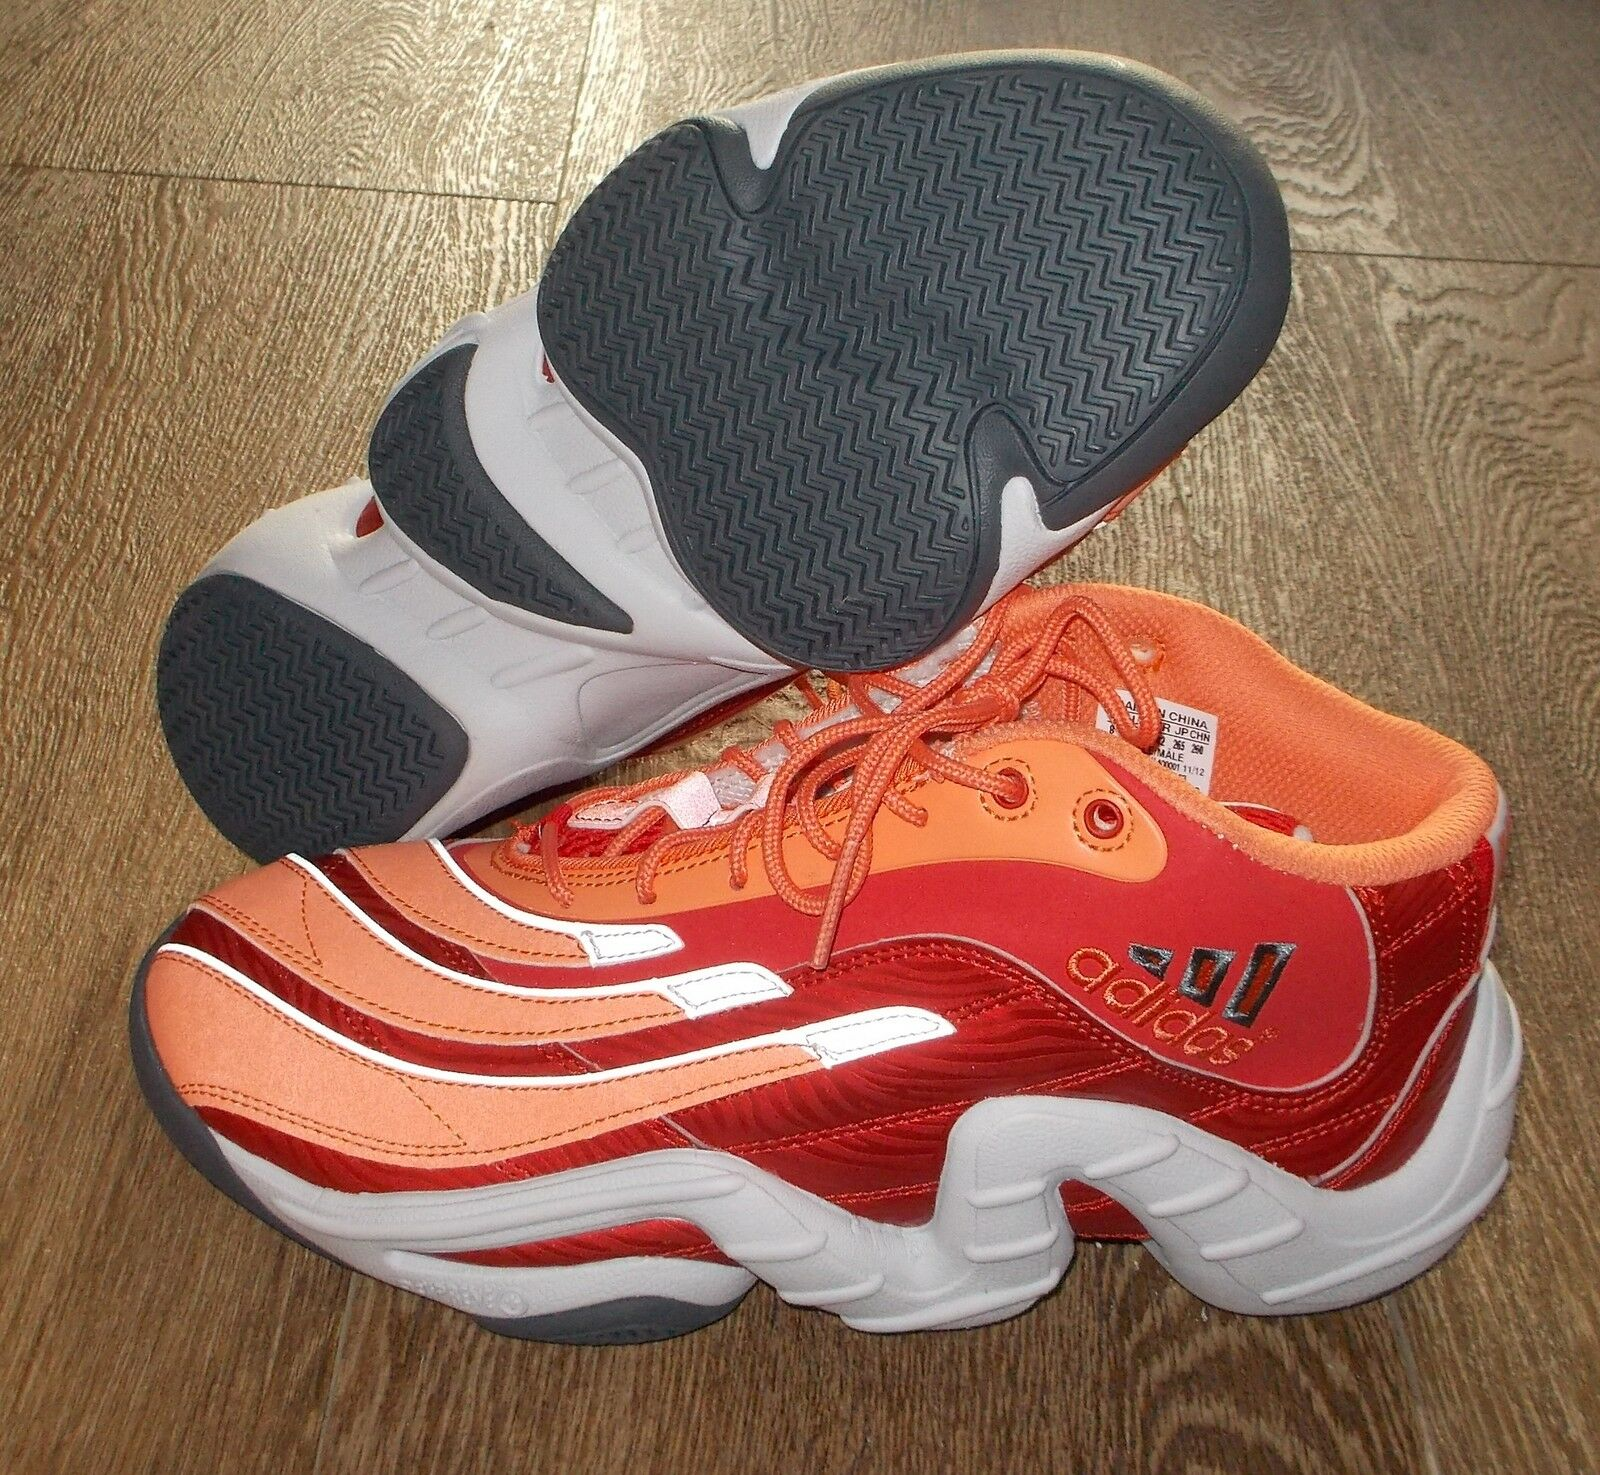 Nuove adidas vera baskerball limited Uomo 8,5 arancione pazzo limited baskerball 6bbd56